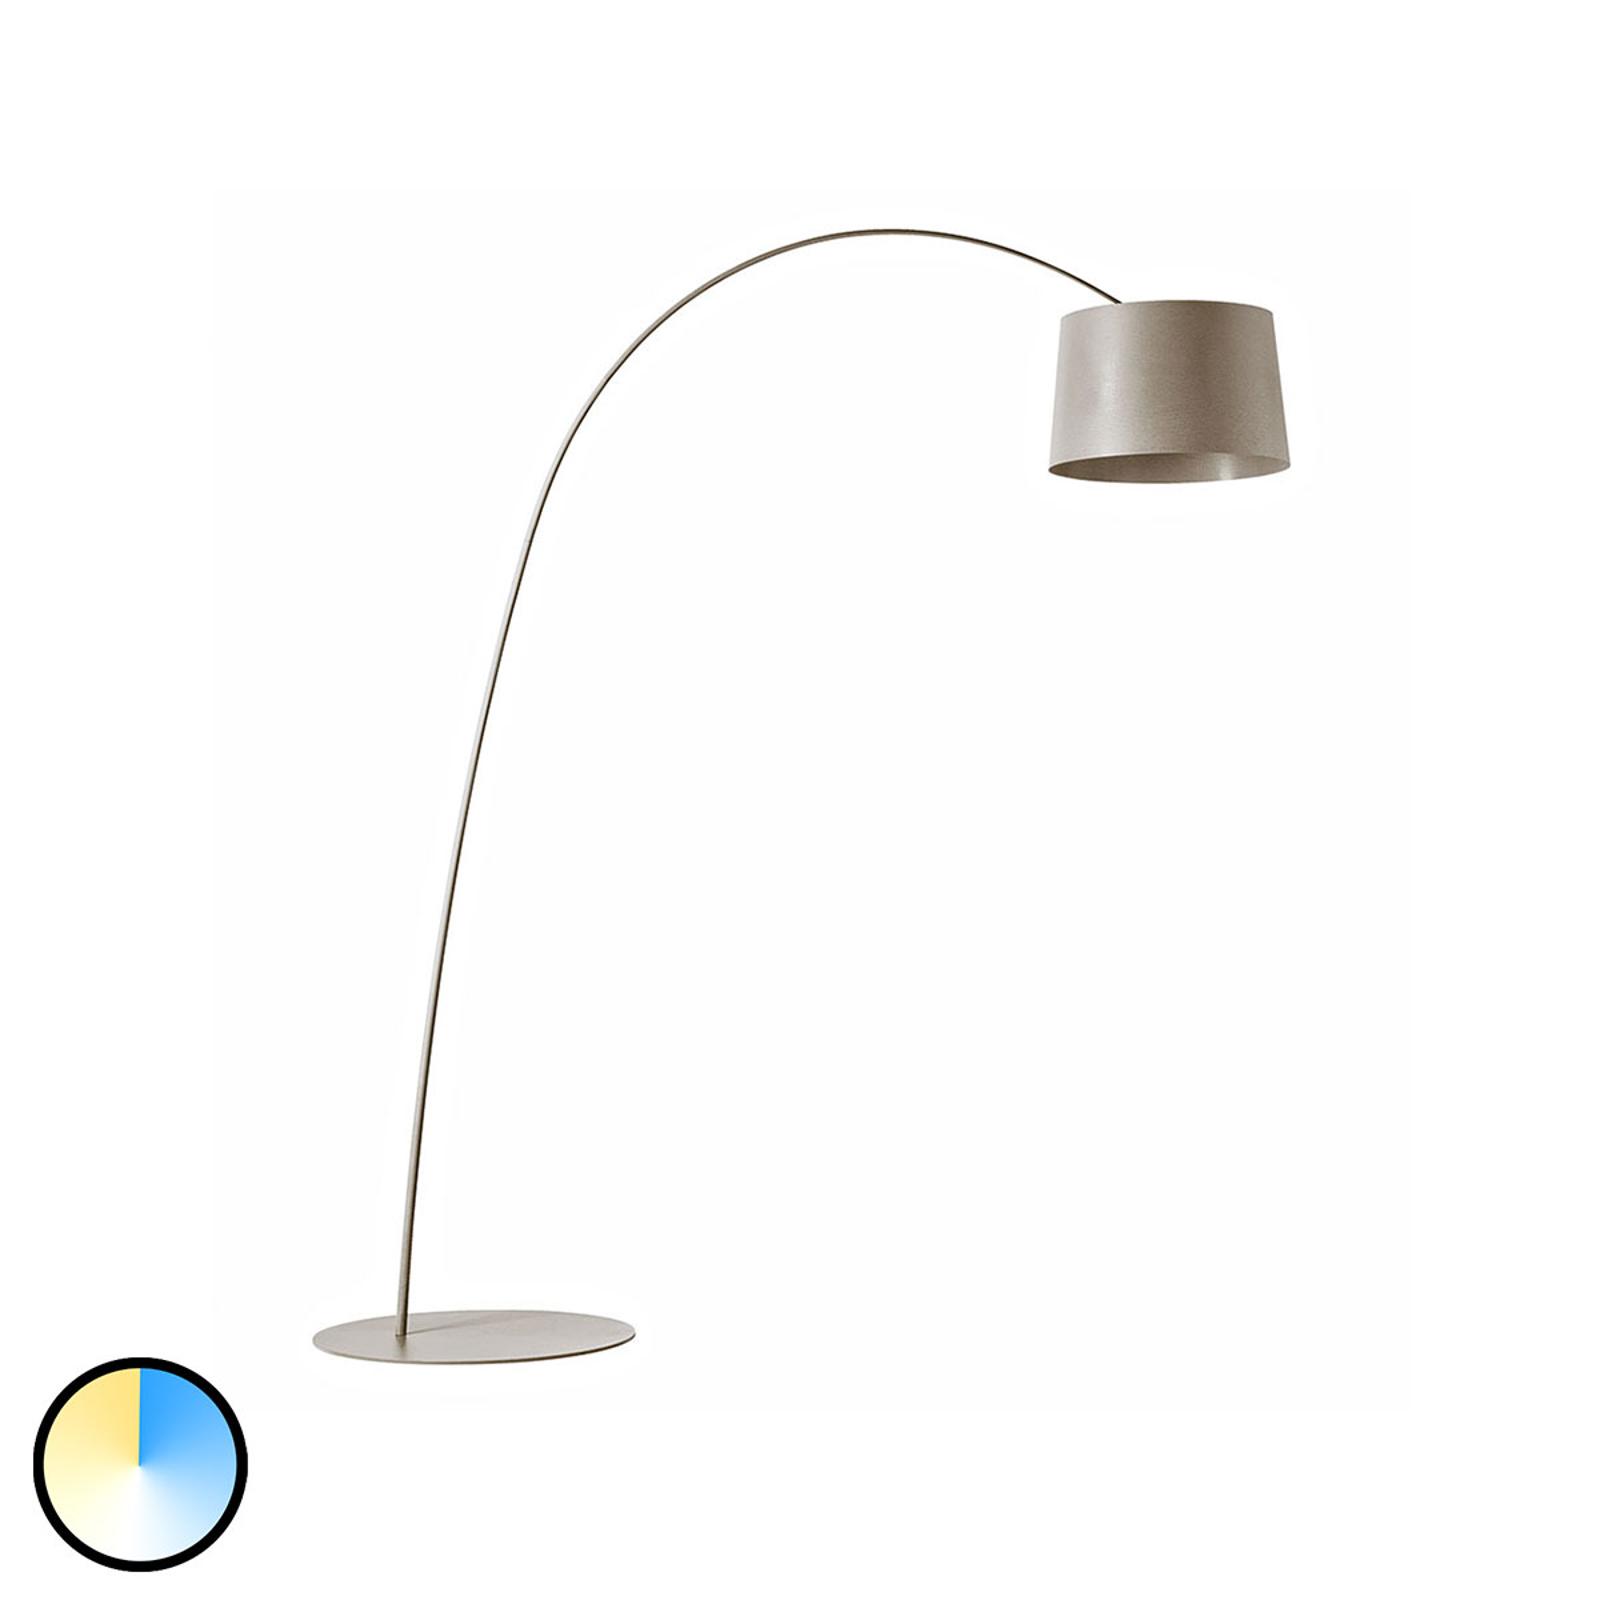 Foscarini MyLight Twiggy LED-buelampe, greige